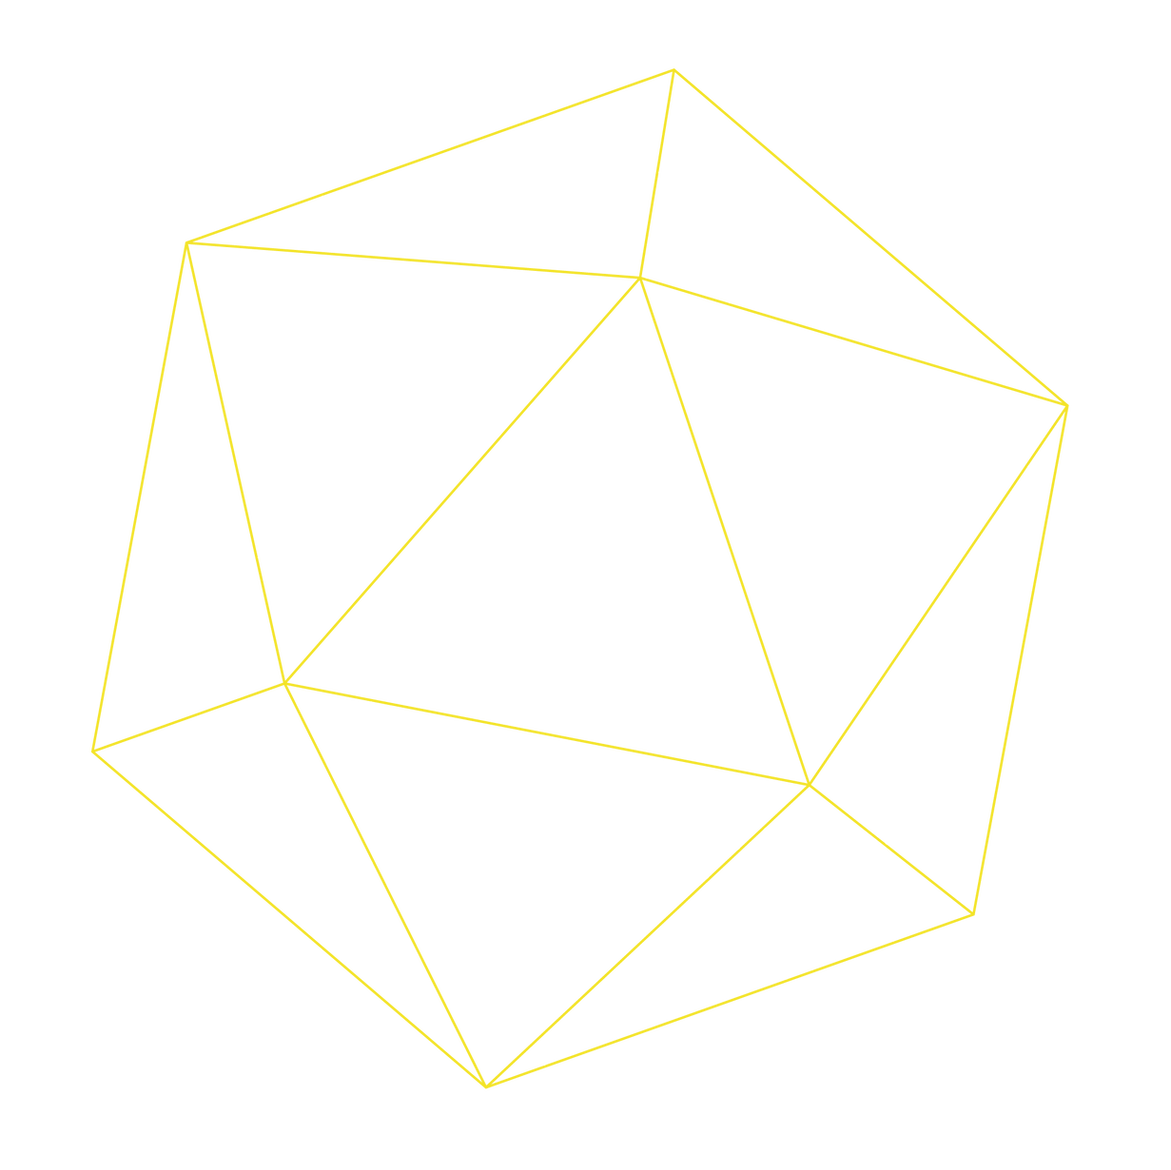 isocahedron yellow skeleton.png